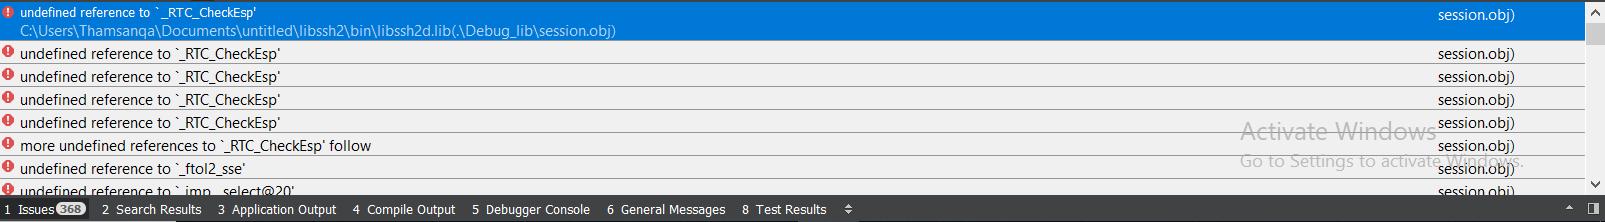 0_1540395645441_errors.PNG